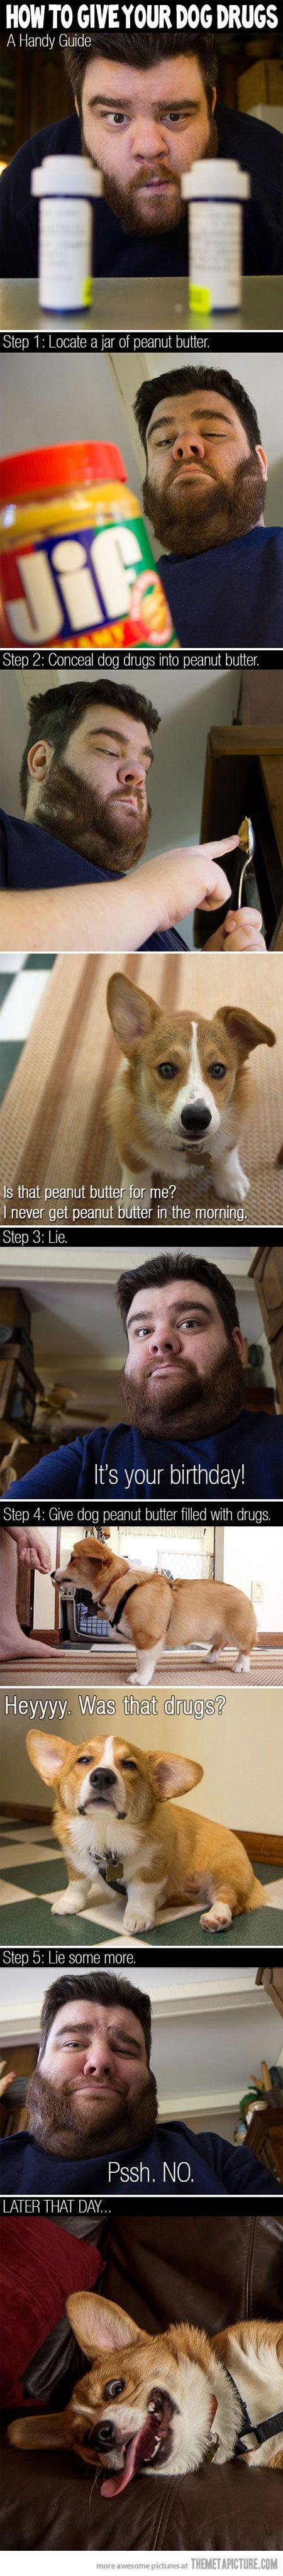 Hahahaha hilarious